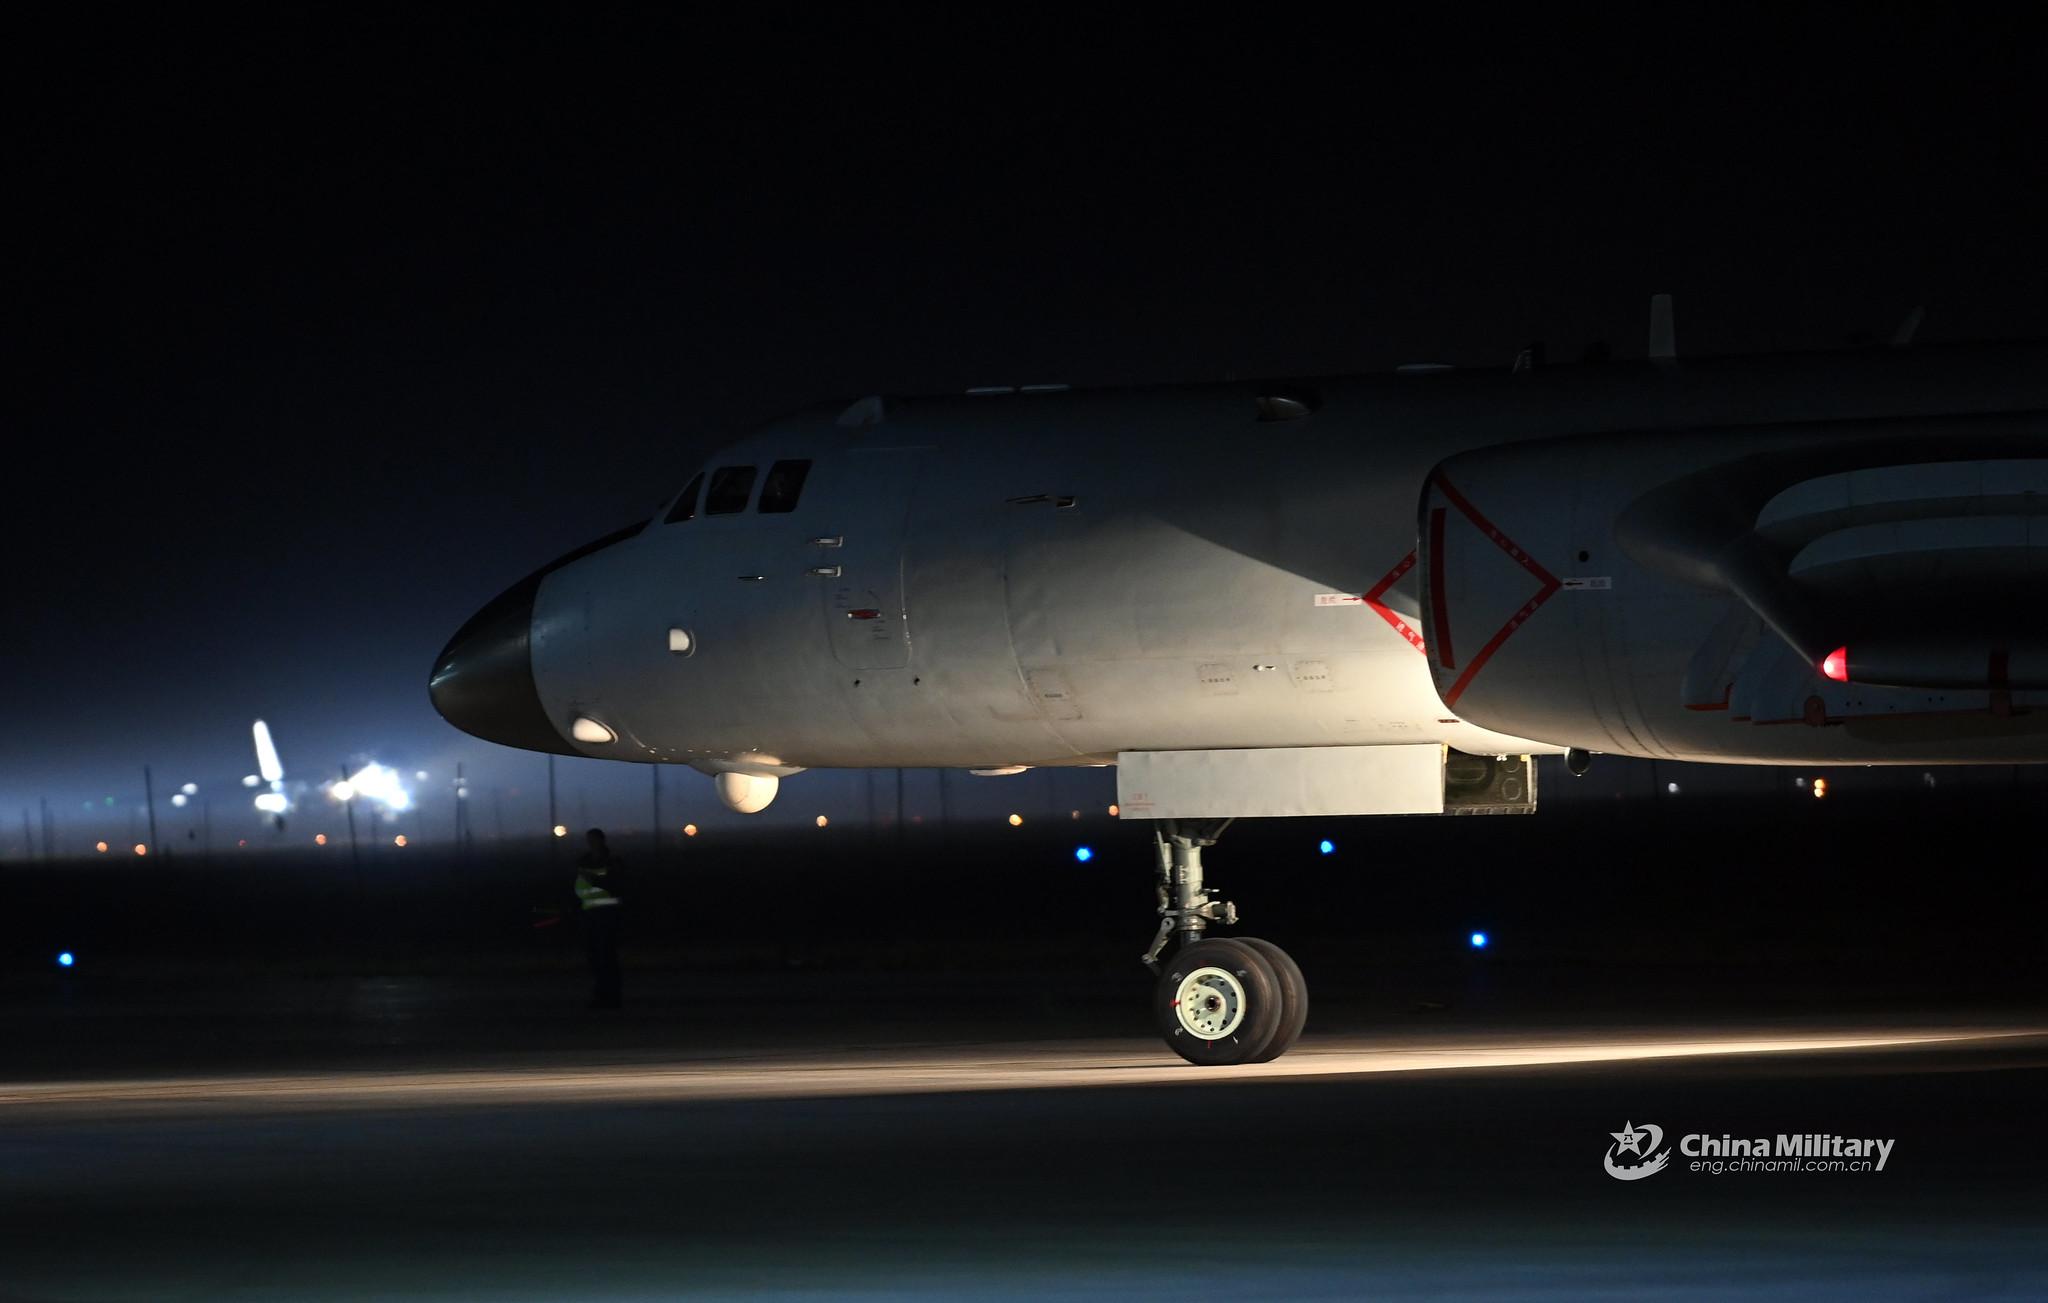 PLA Air Force General News Thread: - Page 11 51101817305_05754b2ca9_k